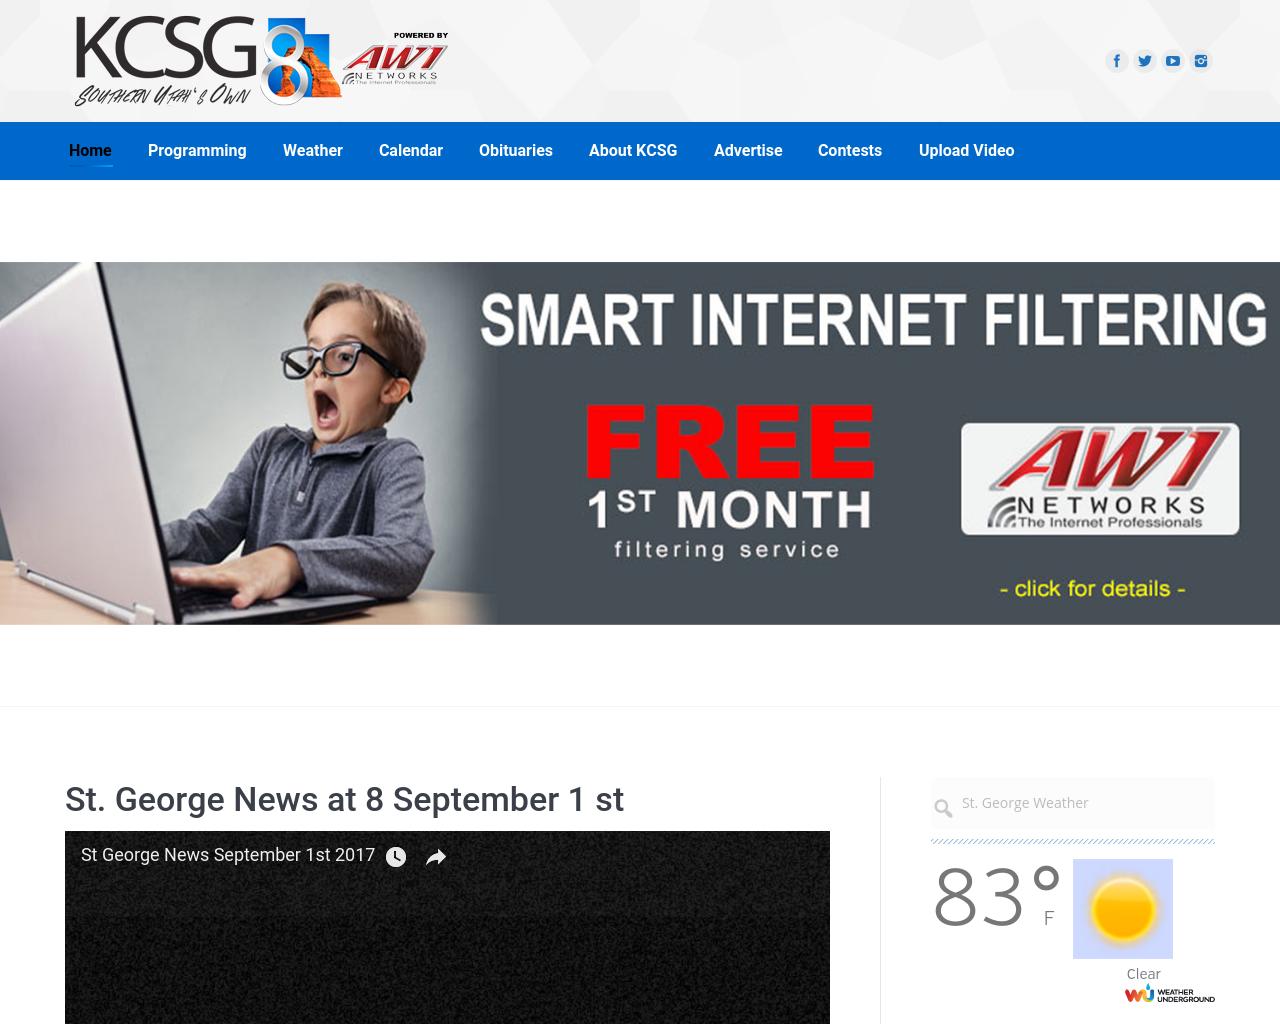 KCSG-Television-Advertising-Reviews-Pricing